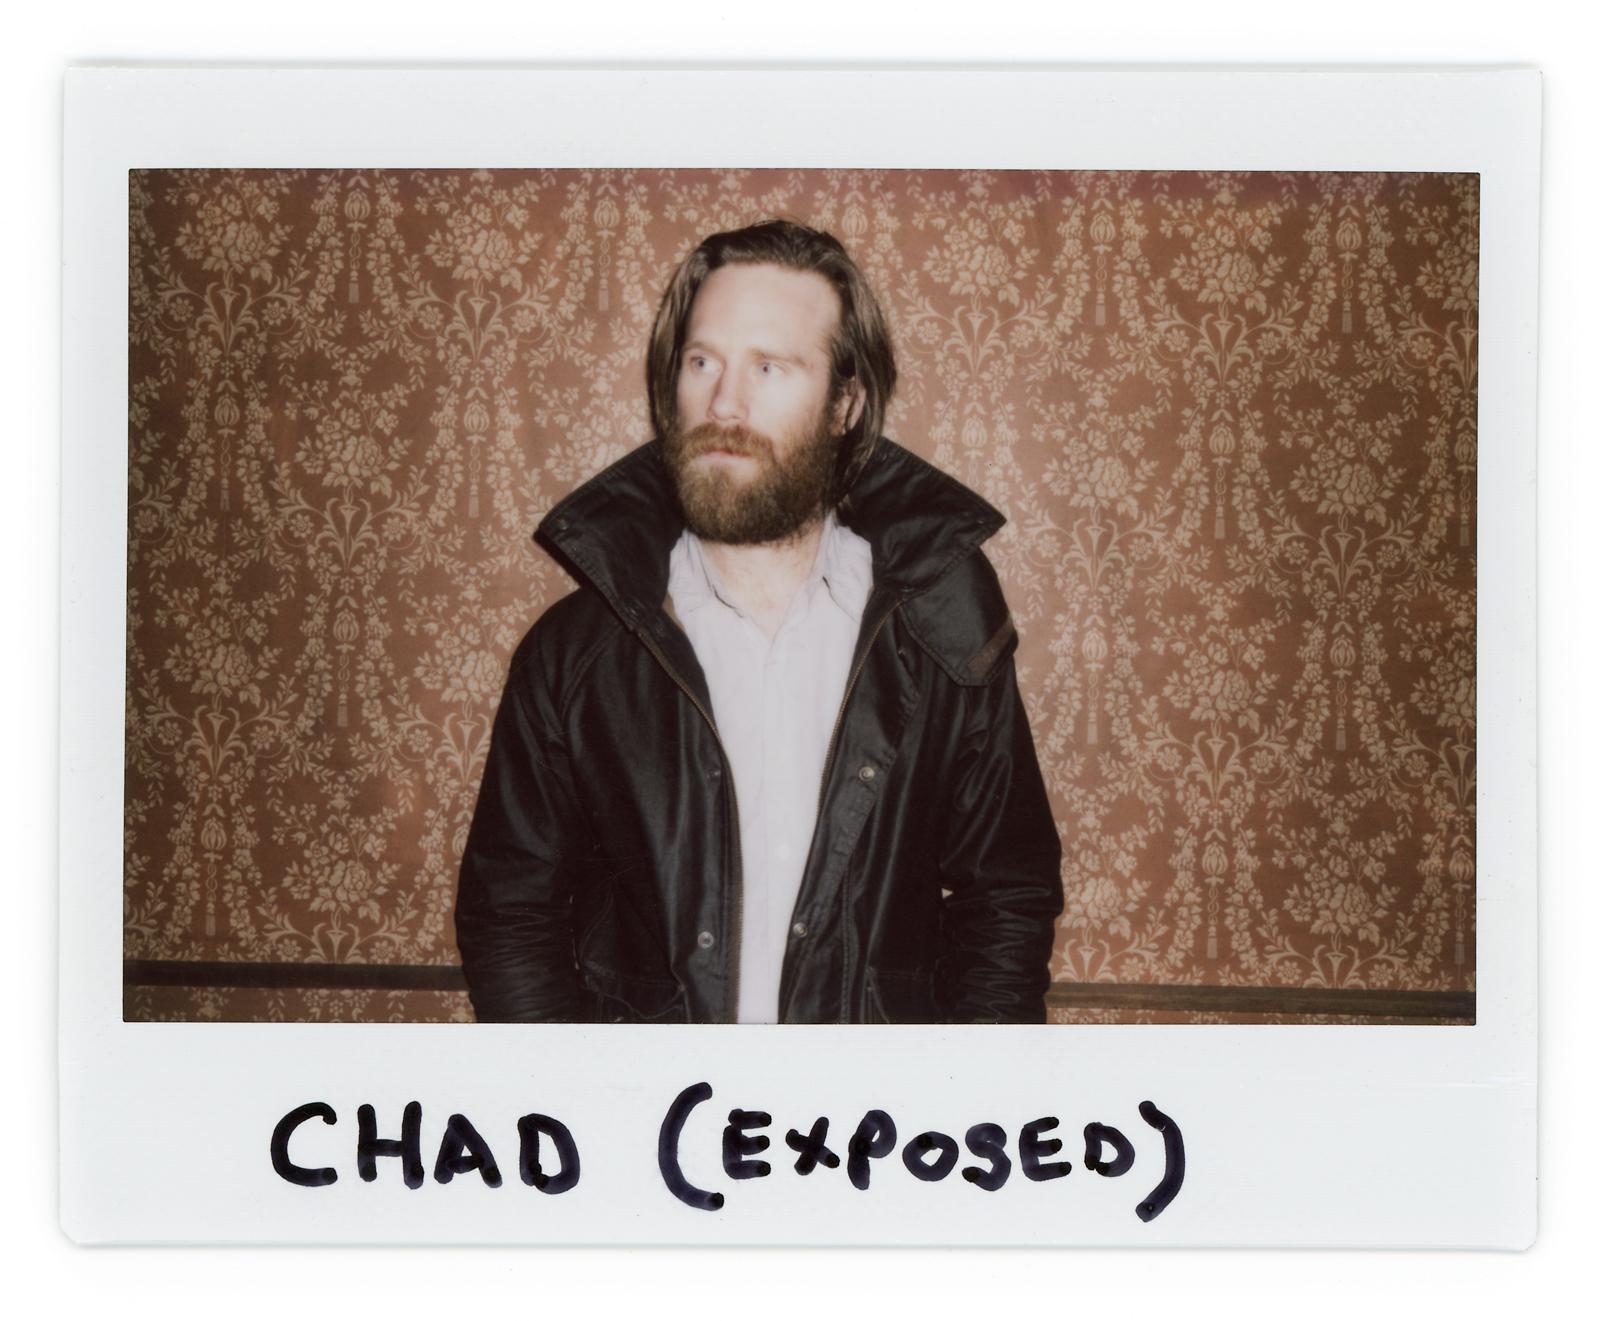 Chad_C.jpg